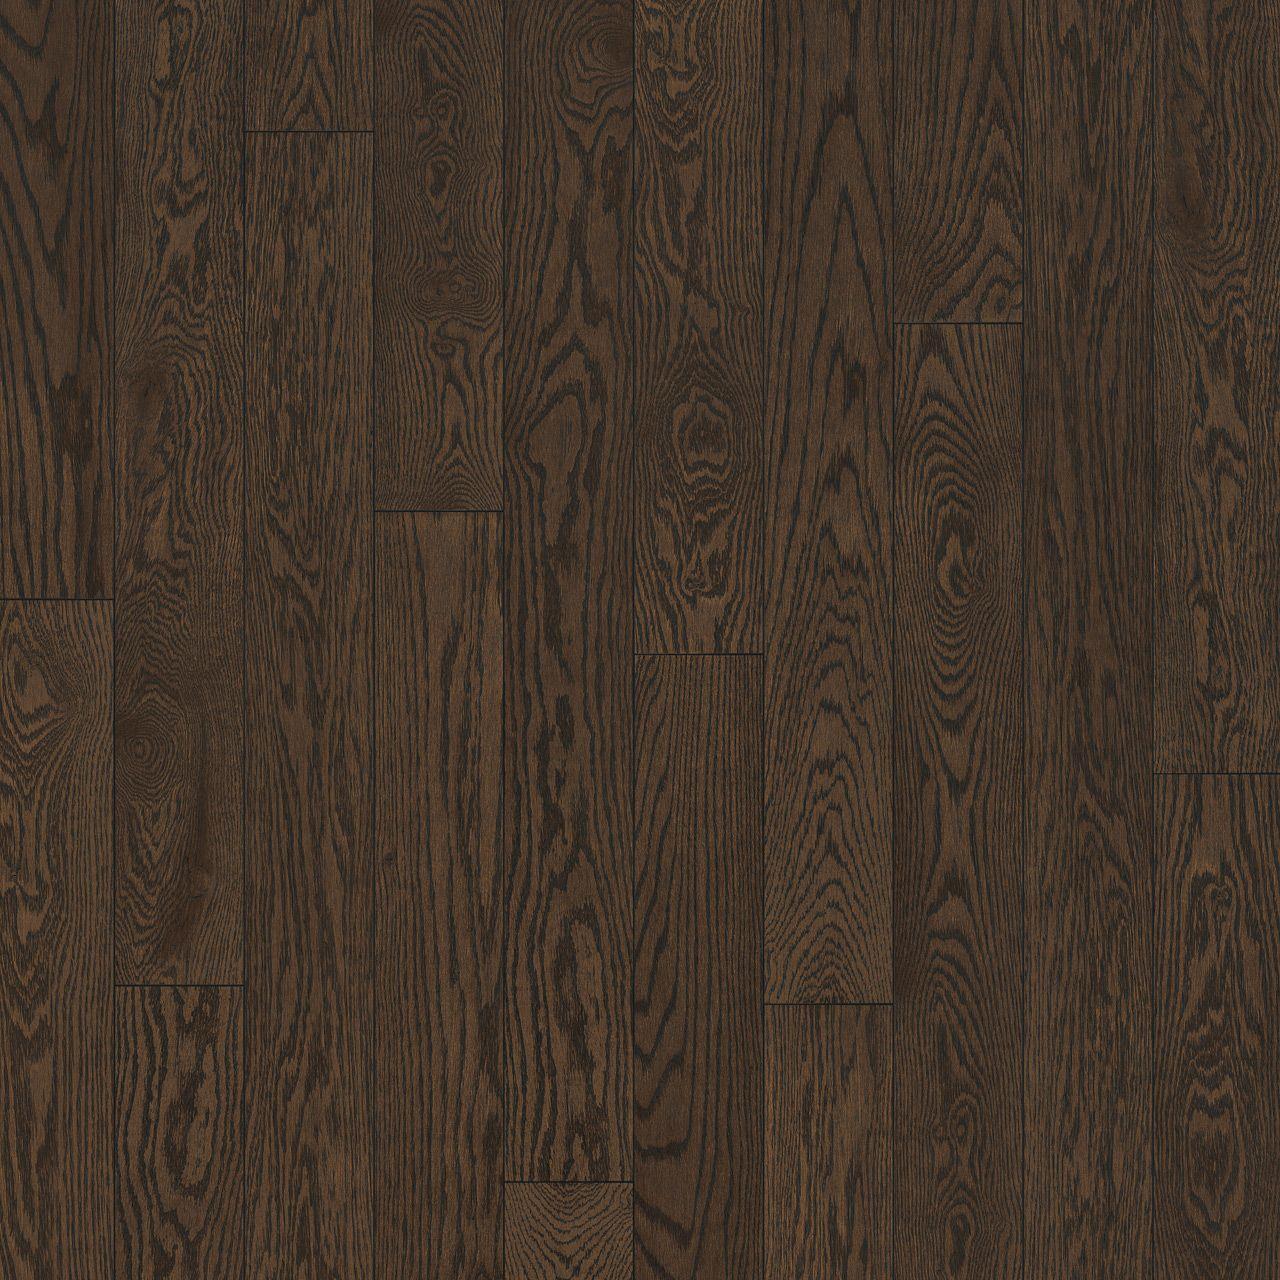 Plancher De Chene Rouge Chocolat Fini Huile Preverco Red Oak Hardwood Hardwood Floors Red Oak